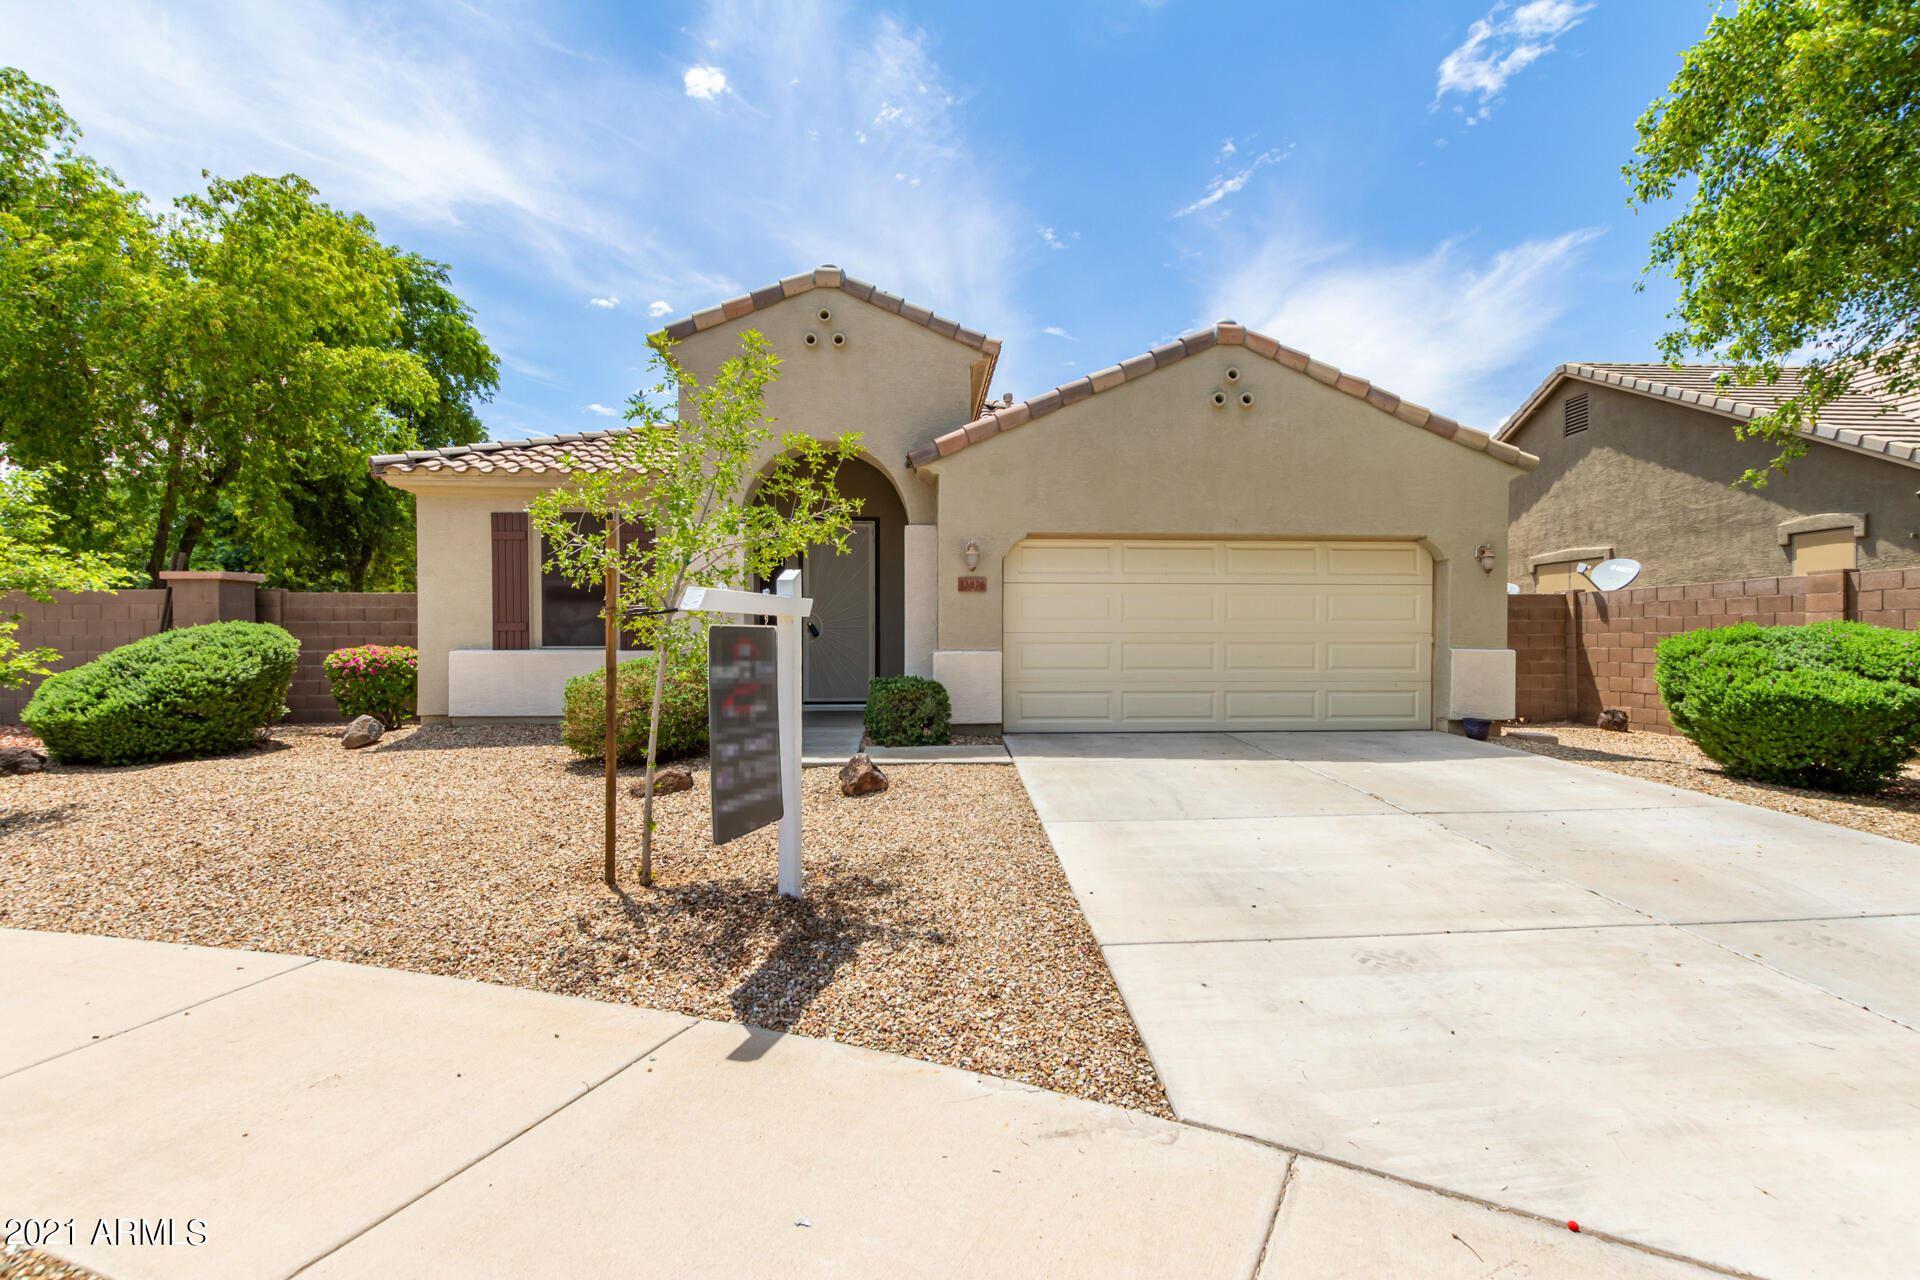 Photo of 13876 N 141ST Lane, Surprise, AZ 85379 (MLS # 6271902)